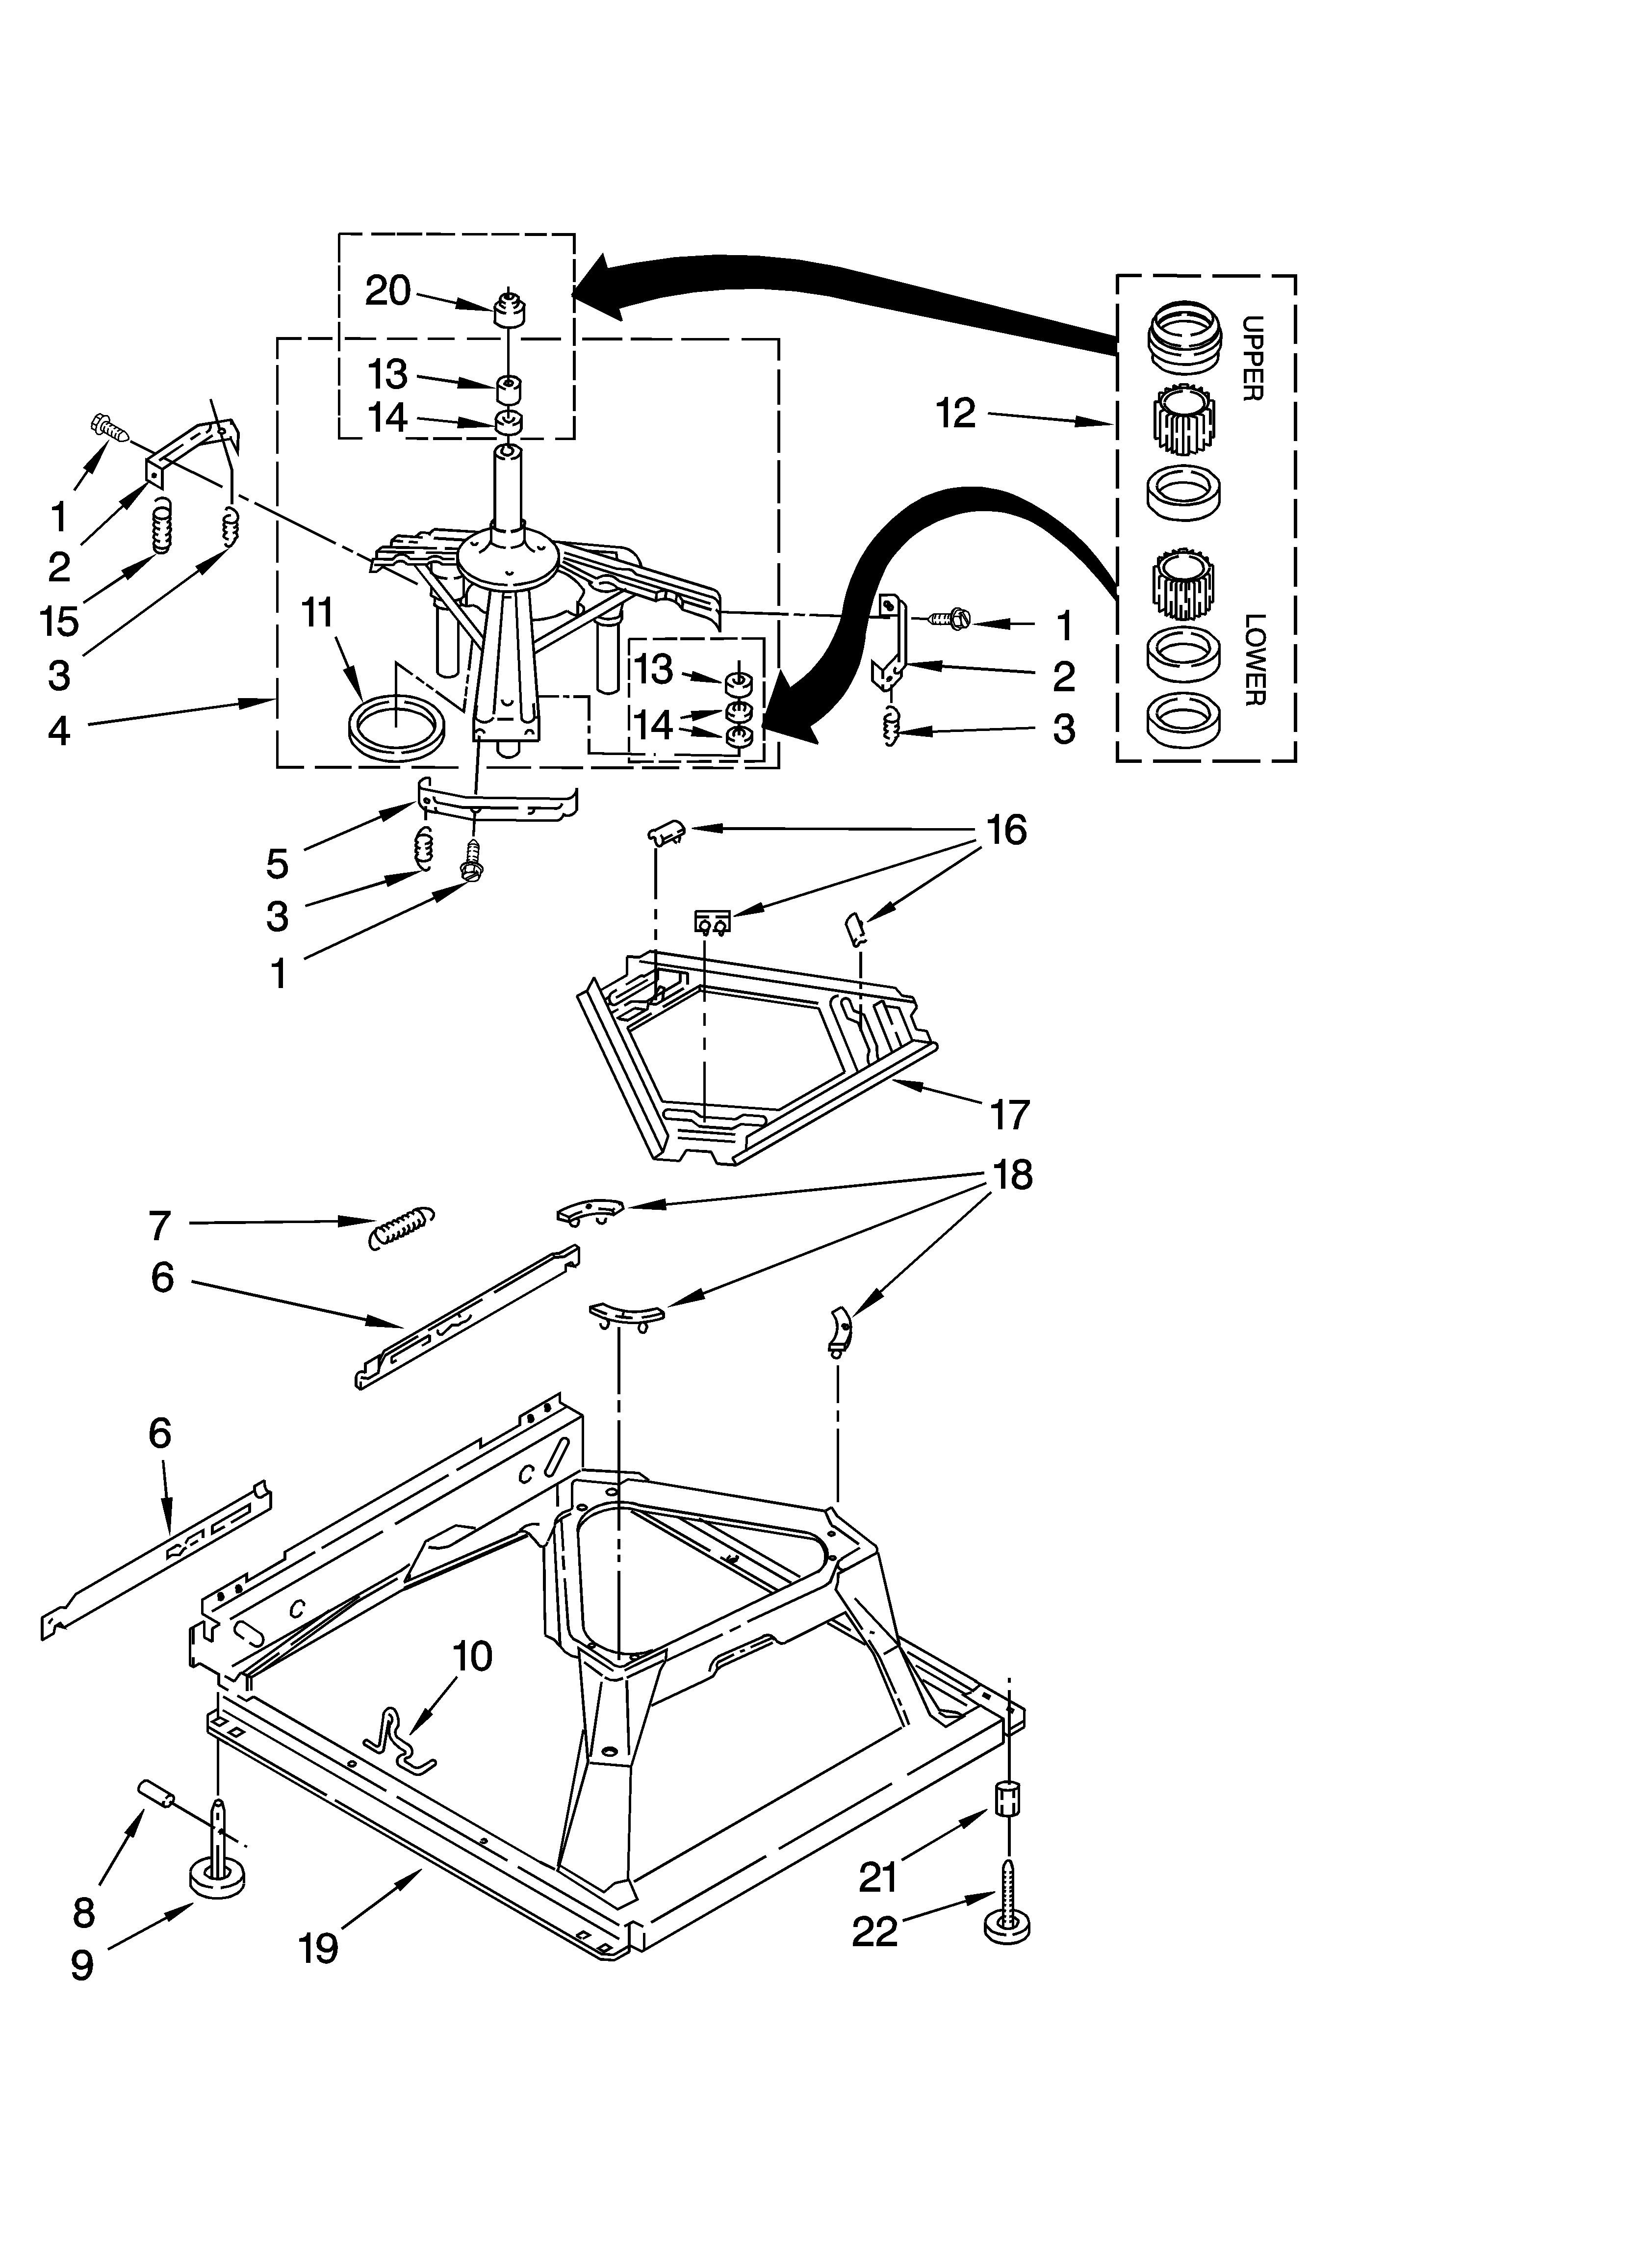 Admiral Washing Machine Parts Diagram Maytag Model Mat14csaww0 Mercial Washers Genuine Parts Of Admiral Washing Machine Parts Diagram